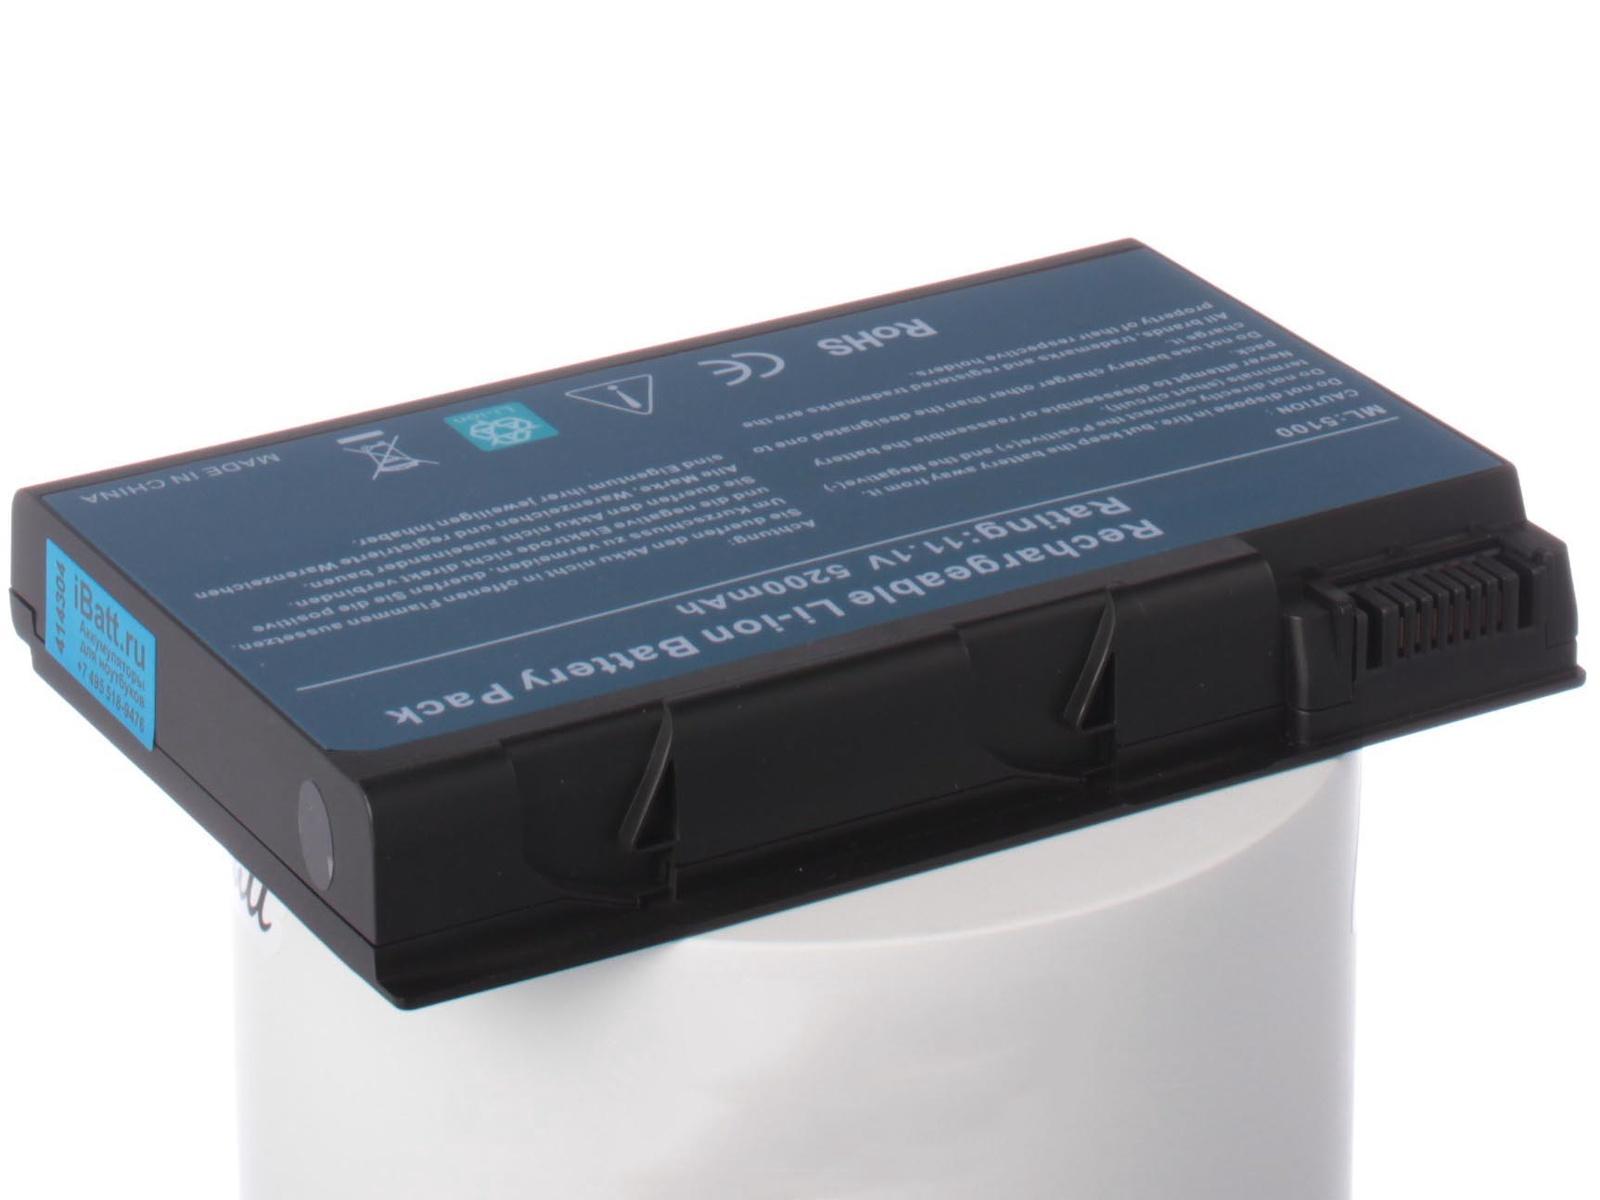 Аккумулятор для ноутбука iBatt для Acer TravelMate 5210, Aspire 3101, Aspire 5635, TravelMate 4202, TravelMate 4202LMi, Aspire 5105, Aspire 5684, TravelMate 5512, Aspire 3103, Aspire 5682, Aspire 5683, Aspire 5685WLHi